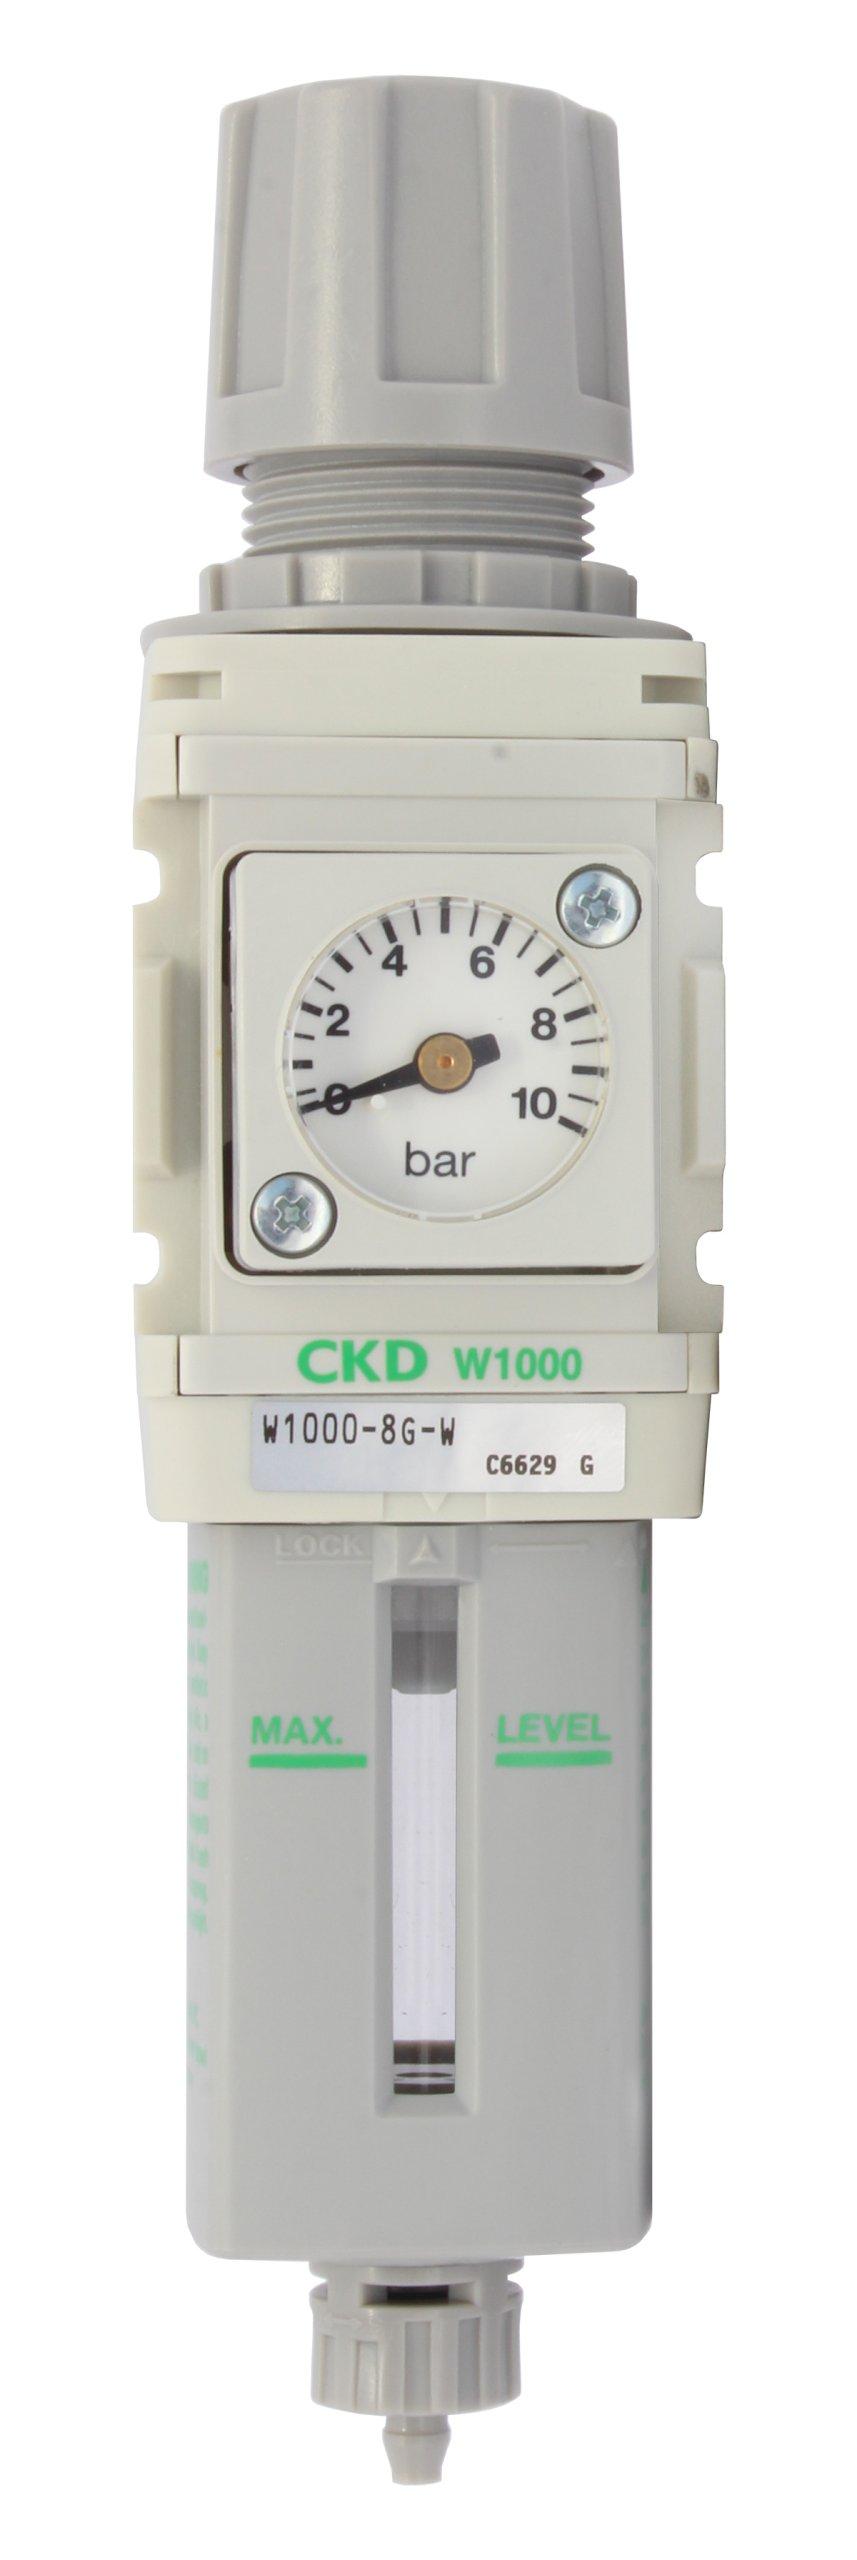 Vzduchový filter so reduktorom W1000 8G 1/4 ' CKD